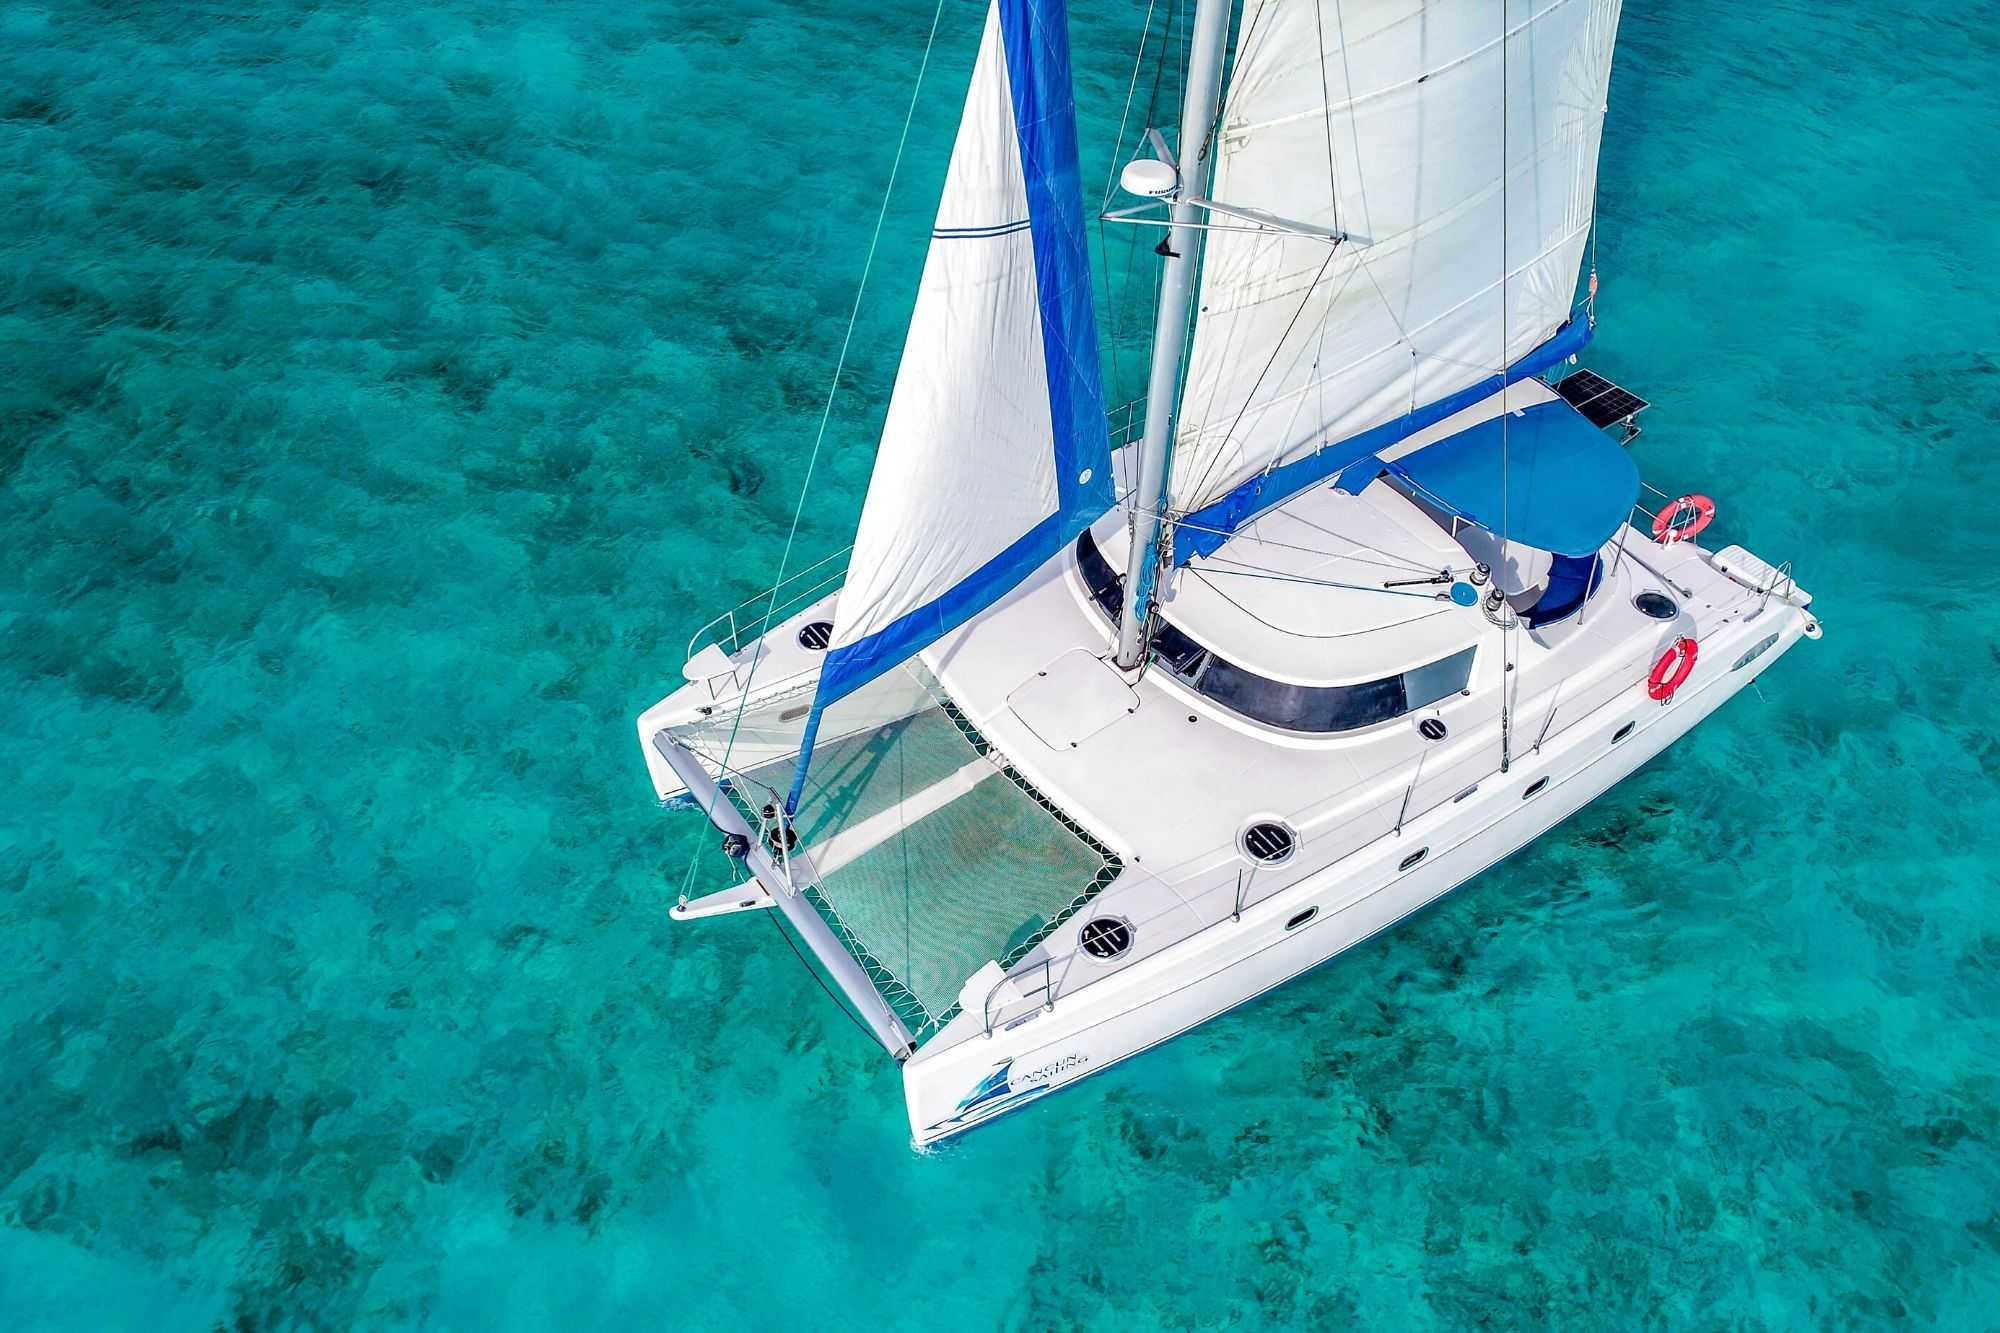 4 Vents - Isla Mujeres Catamaran Tour - Cancun Sailing 6